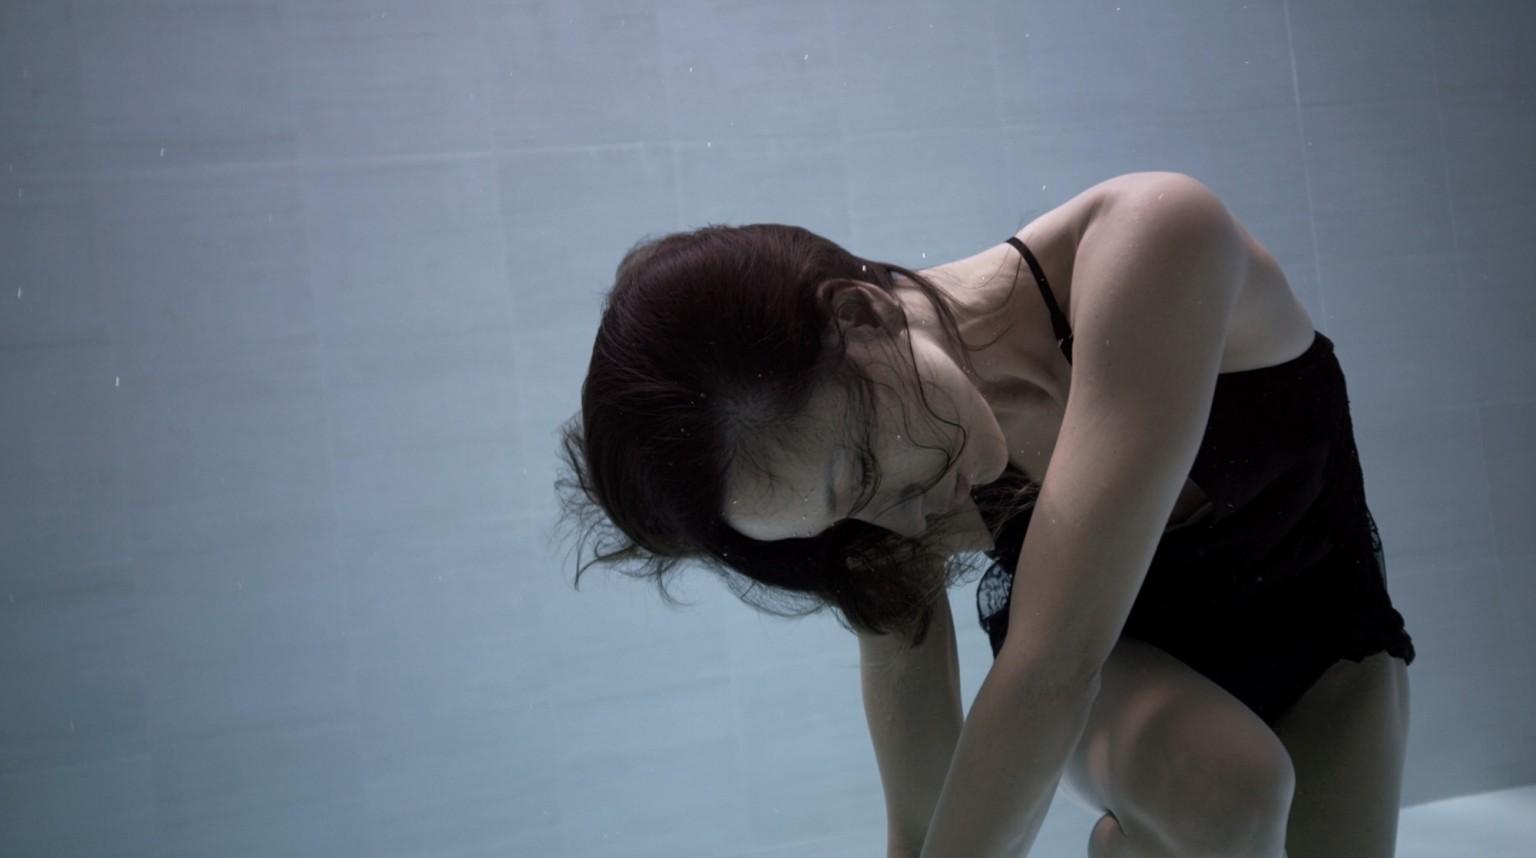 Ama, affascinate danza subacquea di Julie Gautier | Collater.al 2